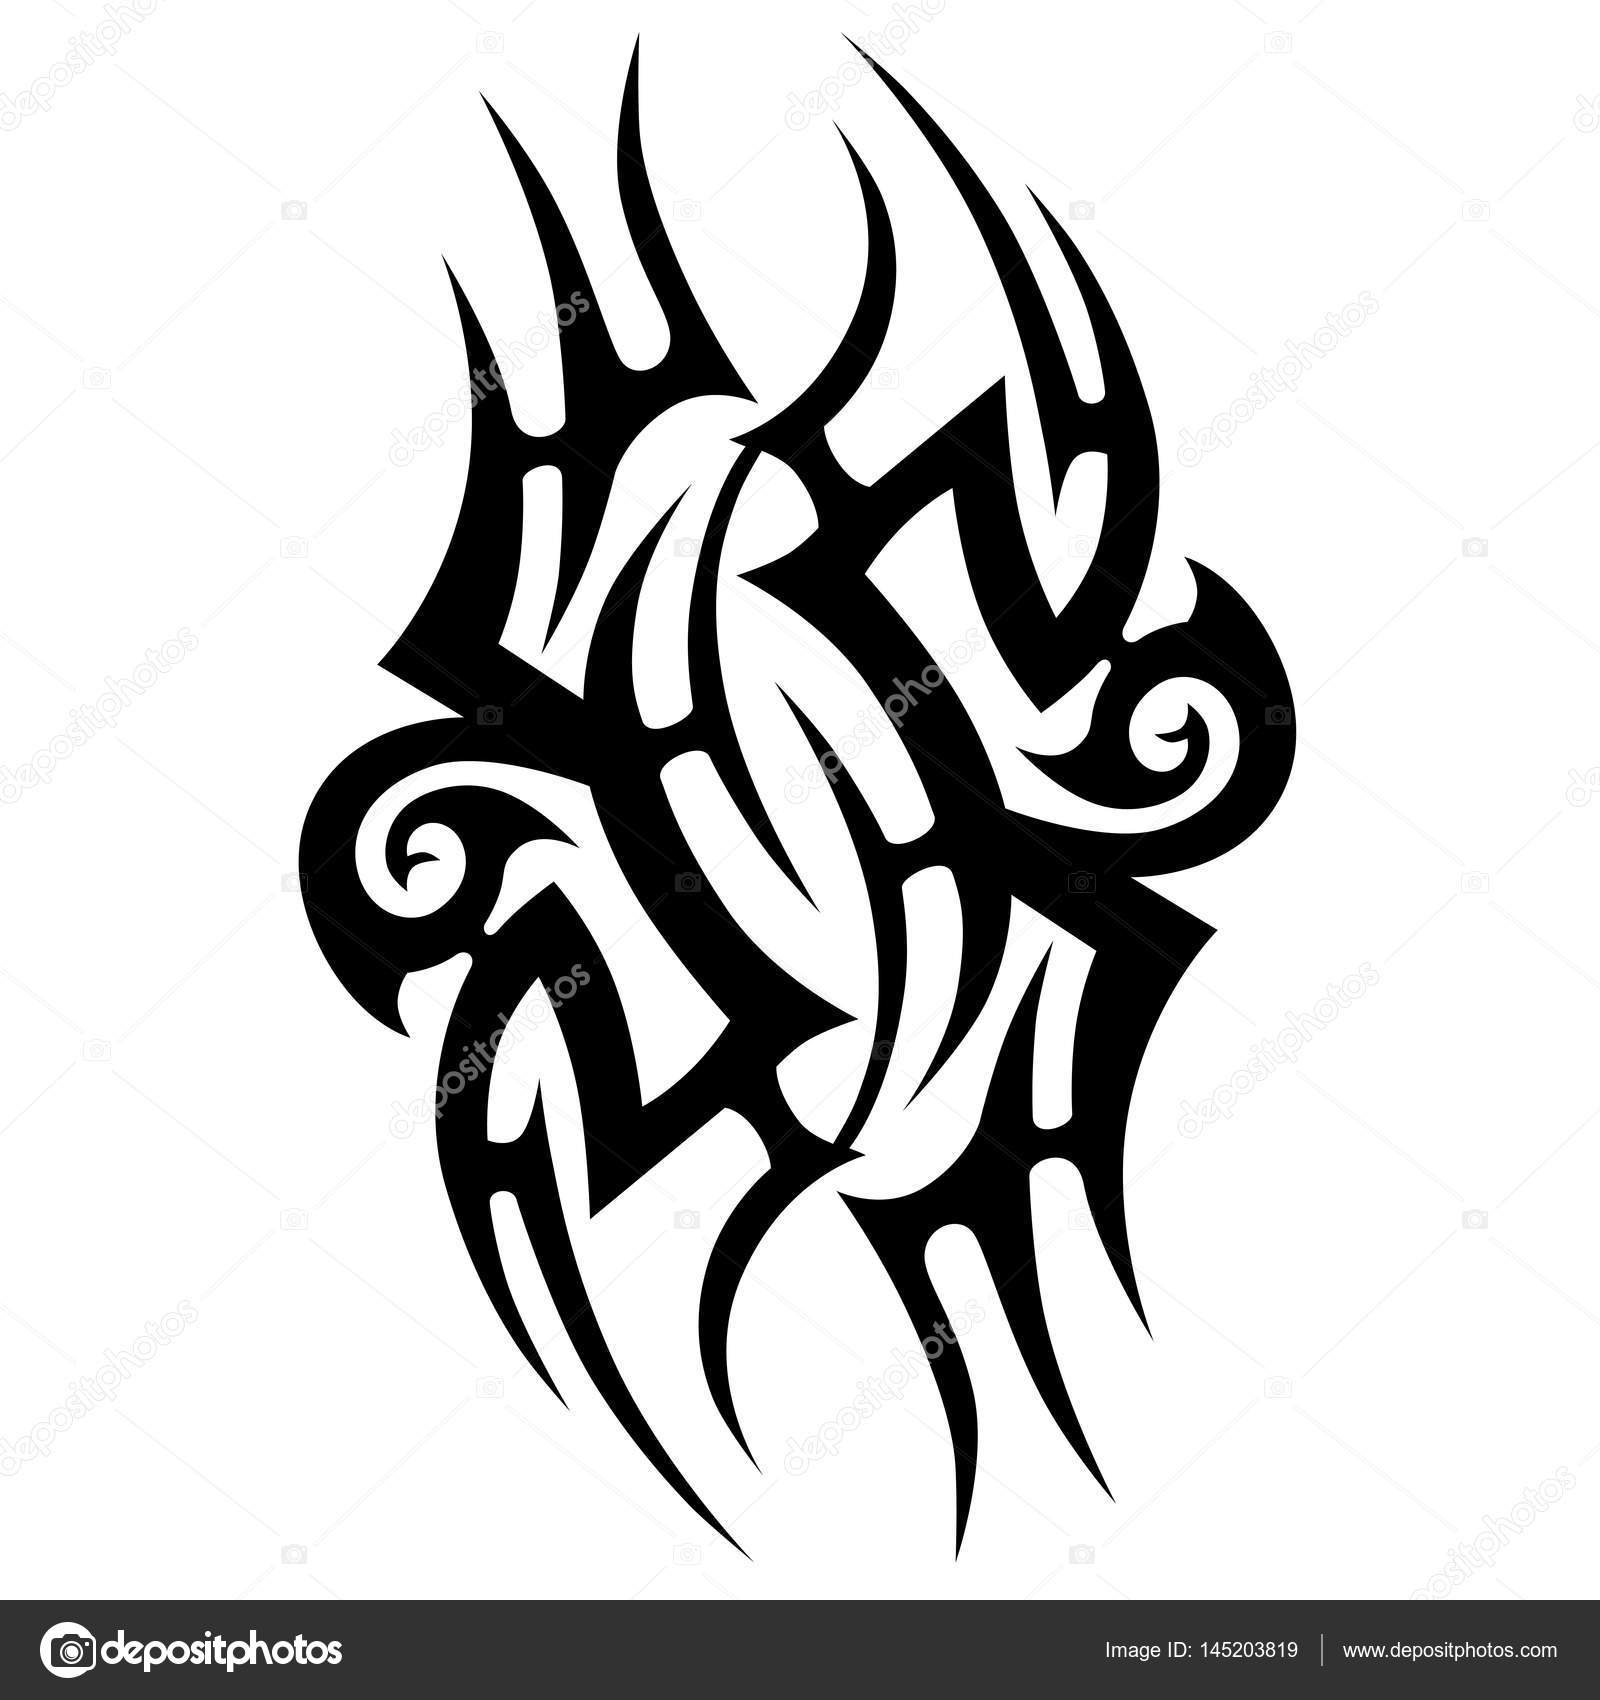 Disenos Tribales Innovadores: Dibujos: Bocetos Tatuajes Maories